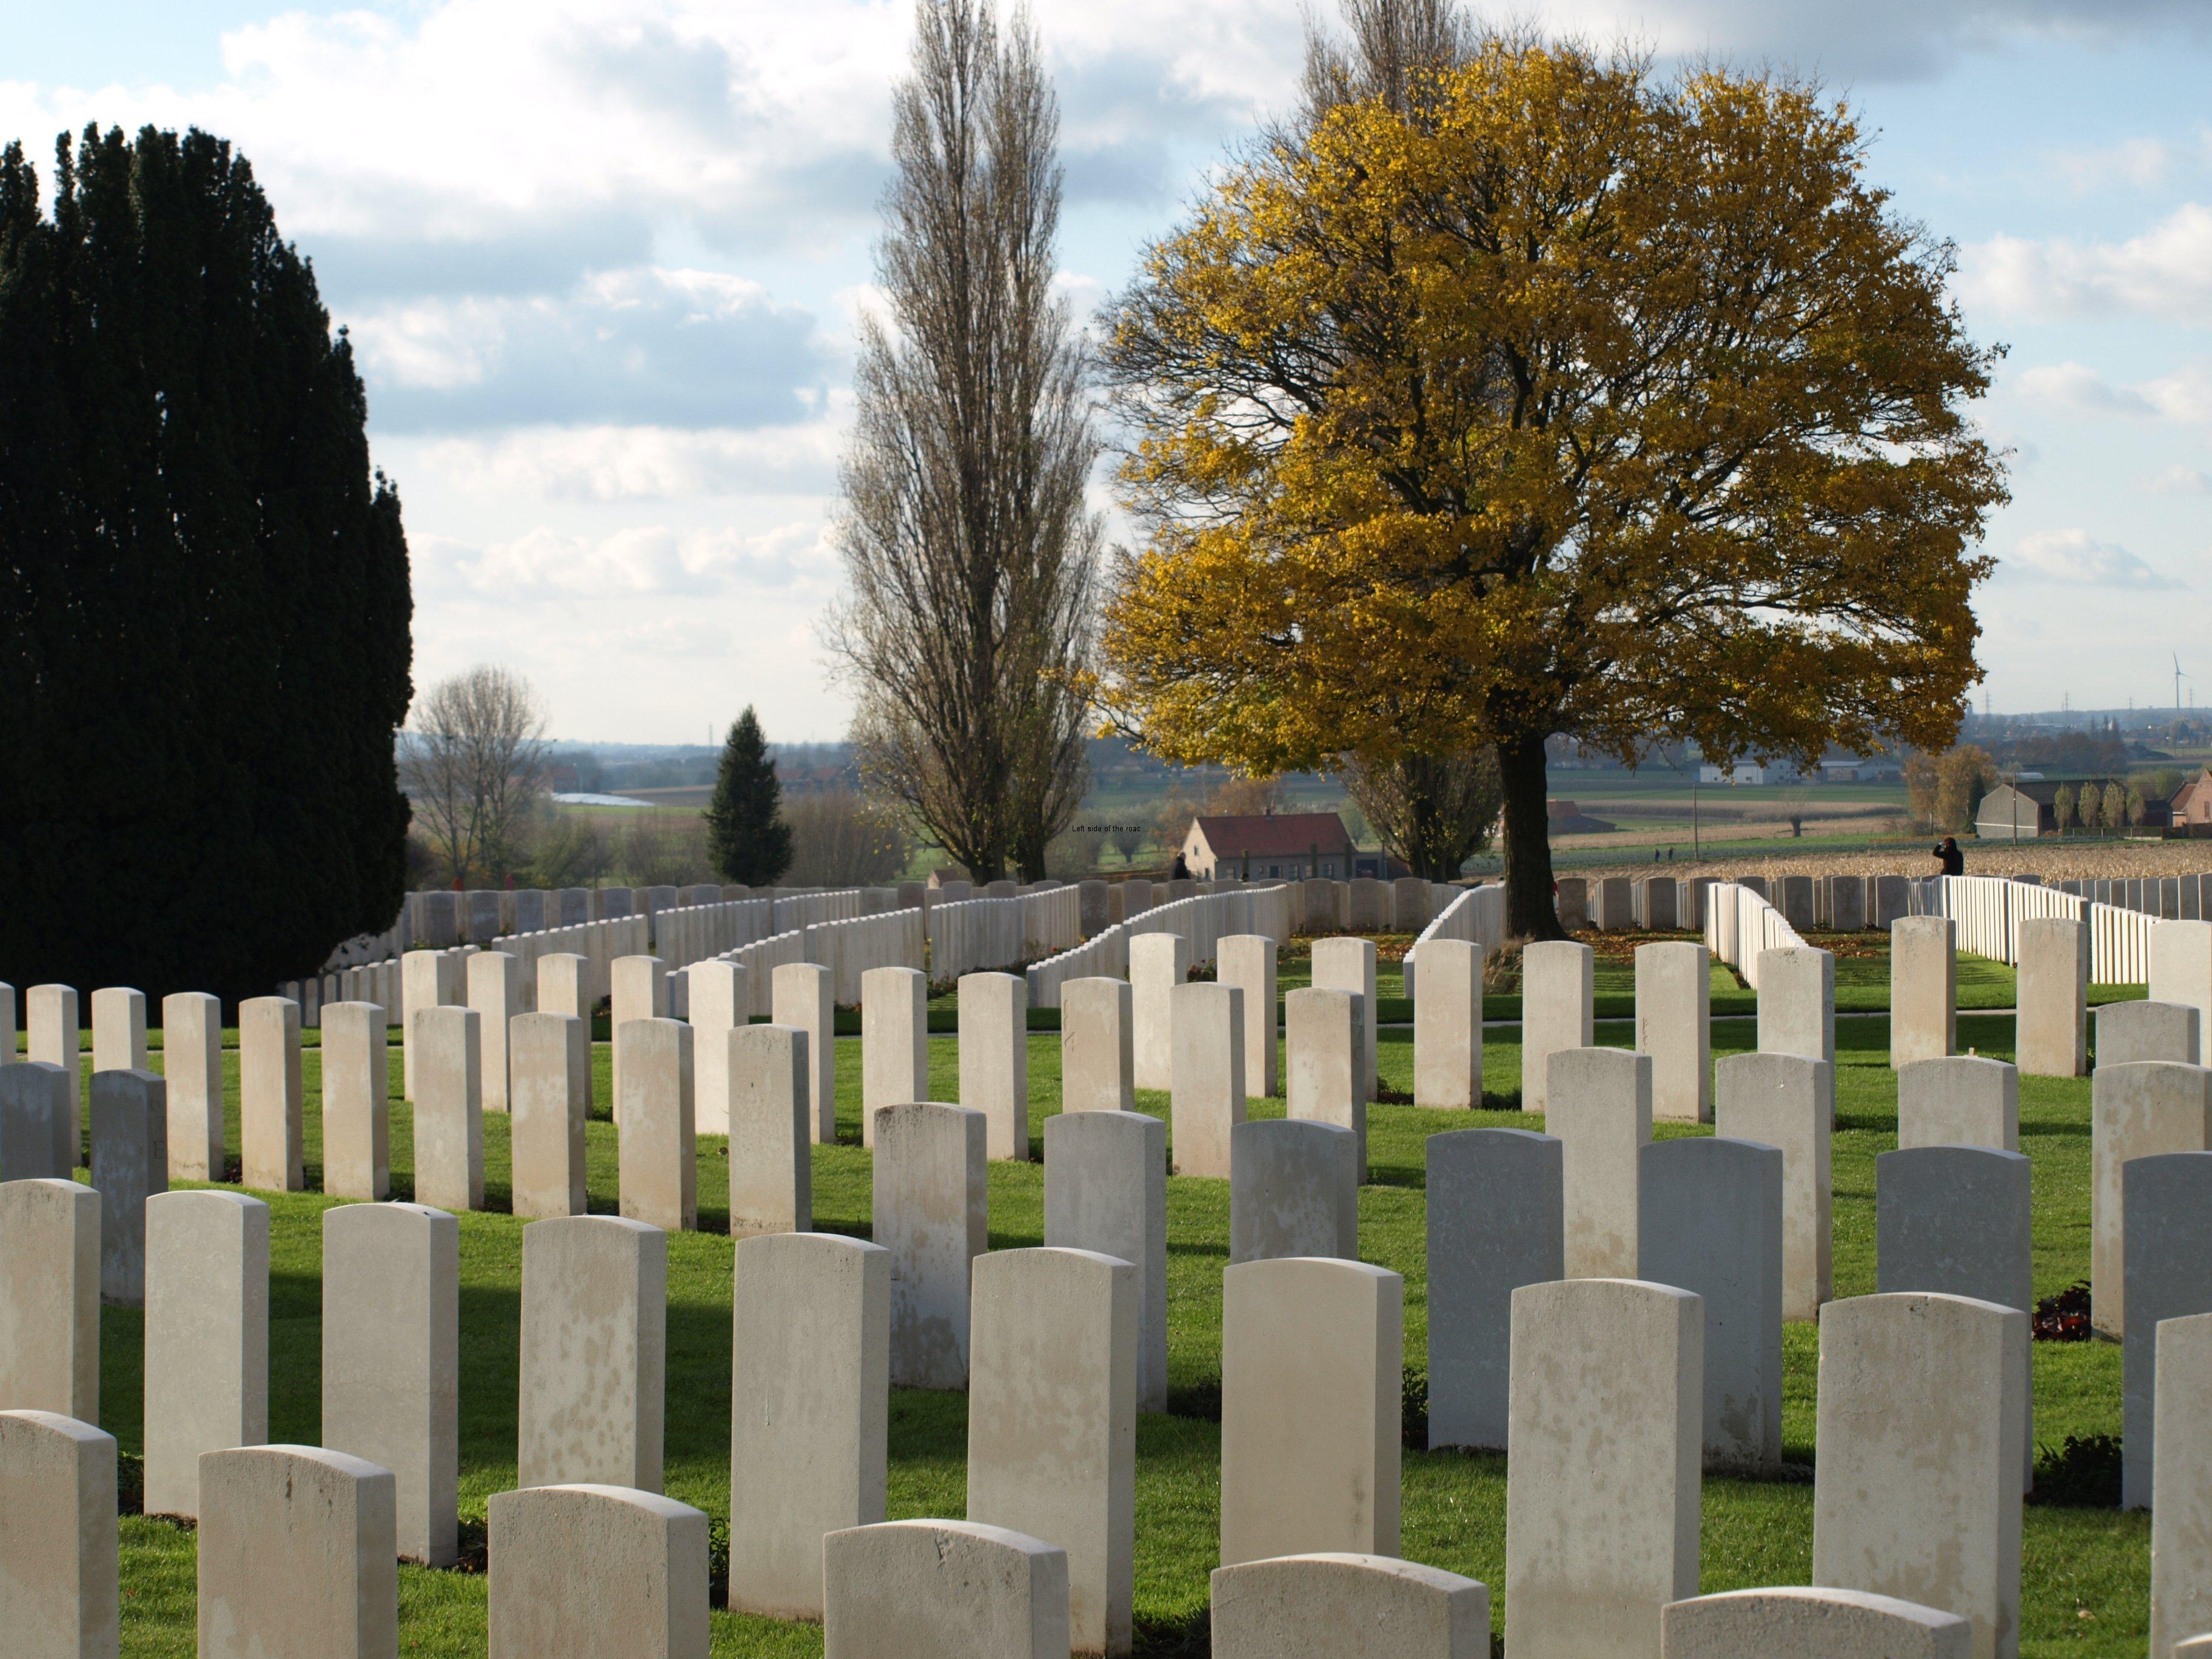 Tyne Cot Cemetery, Passendale, Belgium